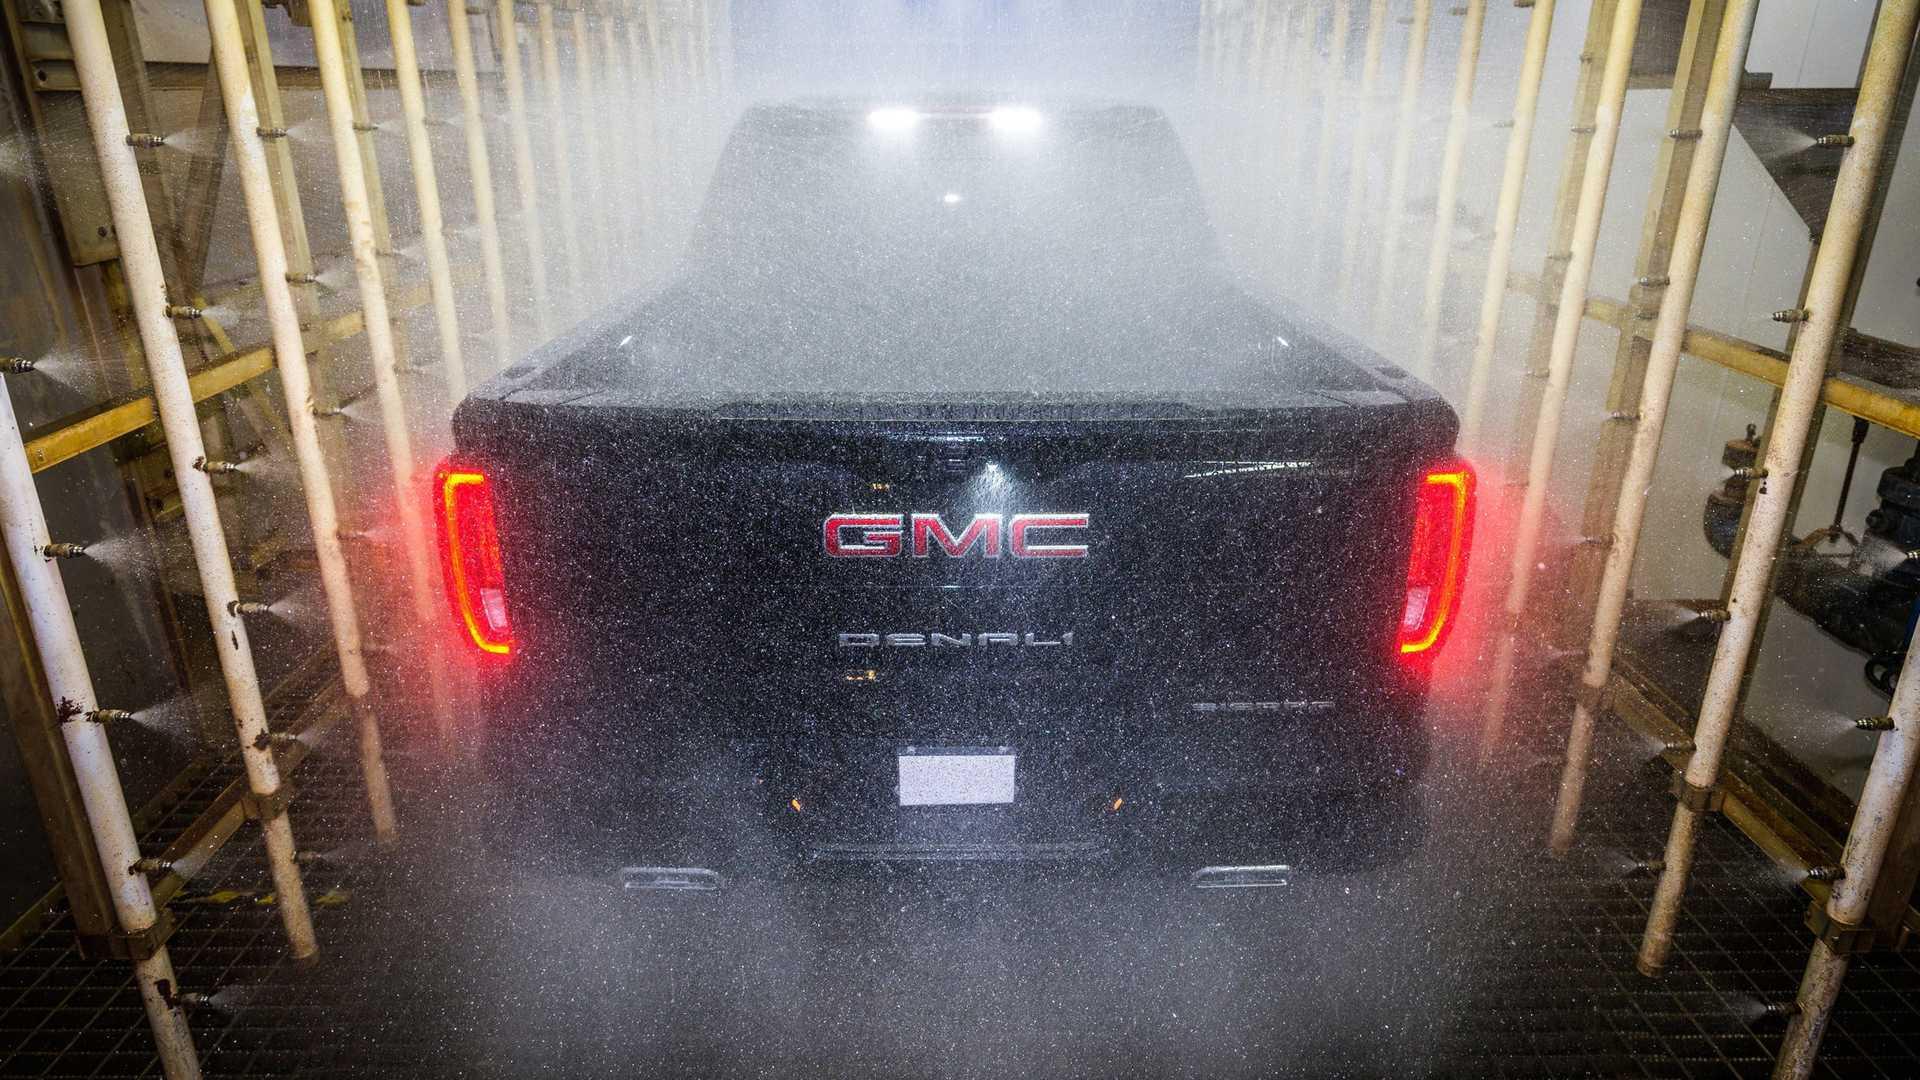 GMC 炭纤维皮卡公布价格,超7万美元,国内土豪有多少愿意买?